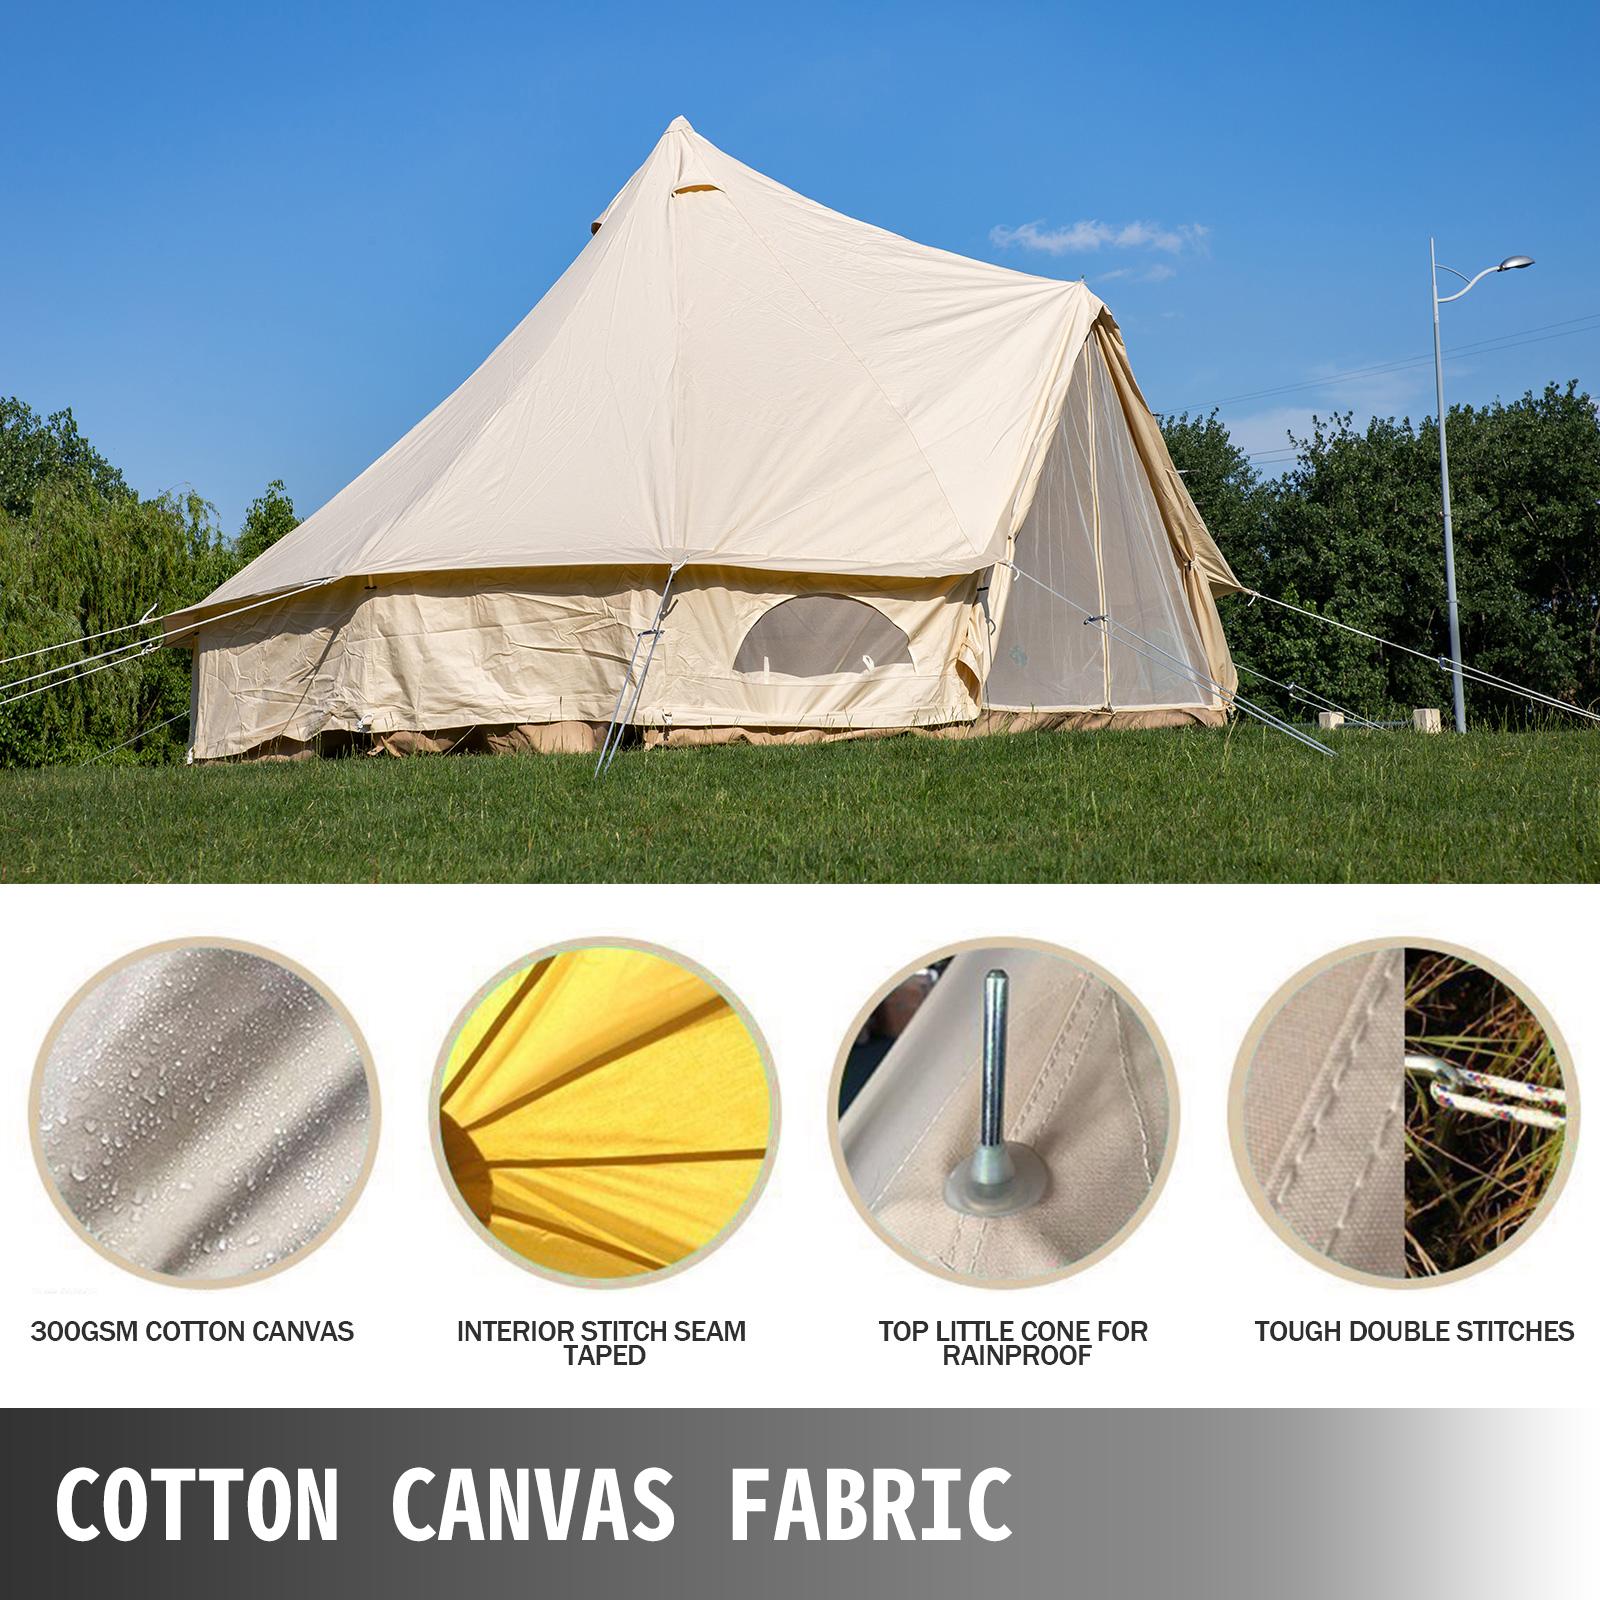 4-Season-Bell-Tent-3-4-5-6M-Waterproof-Cotton-Canvas-Glamping-Camping-Beach-US thumbnail 38